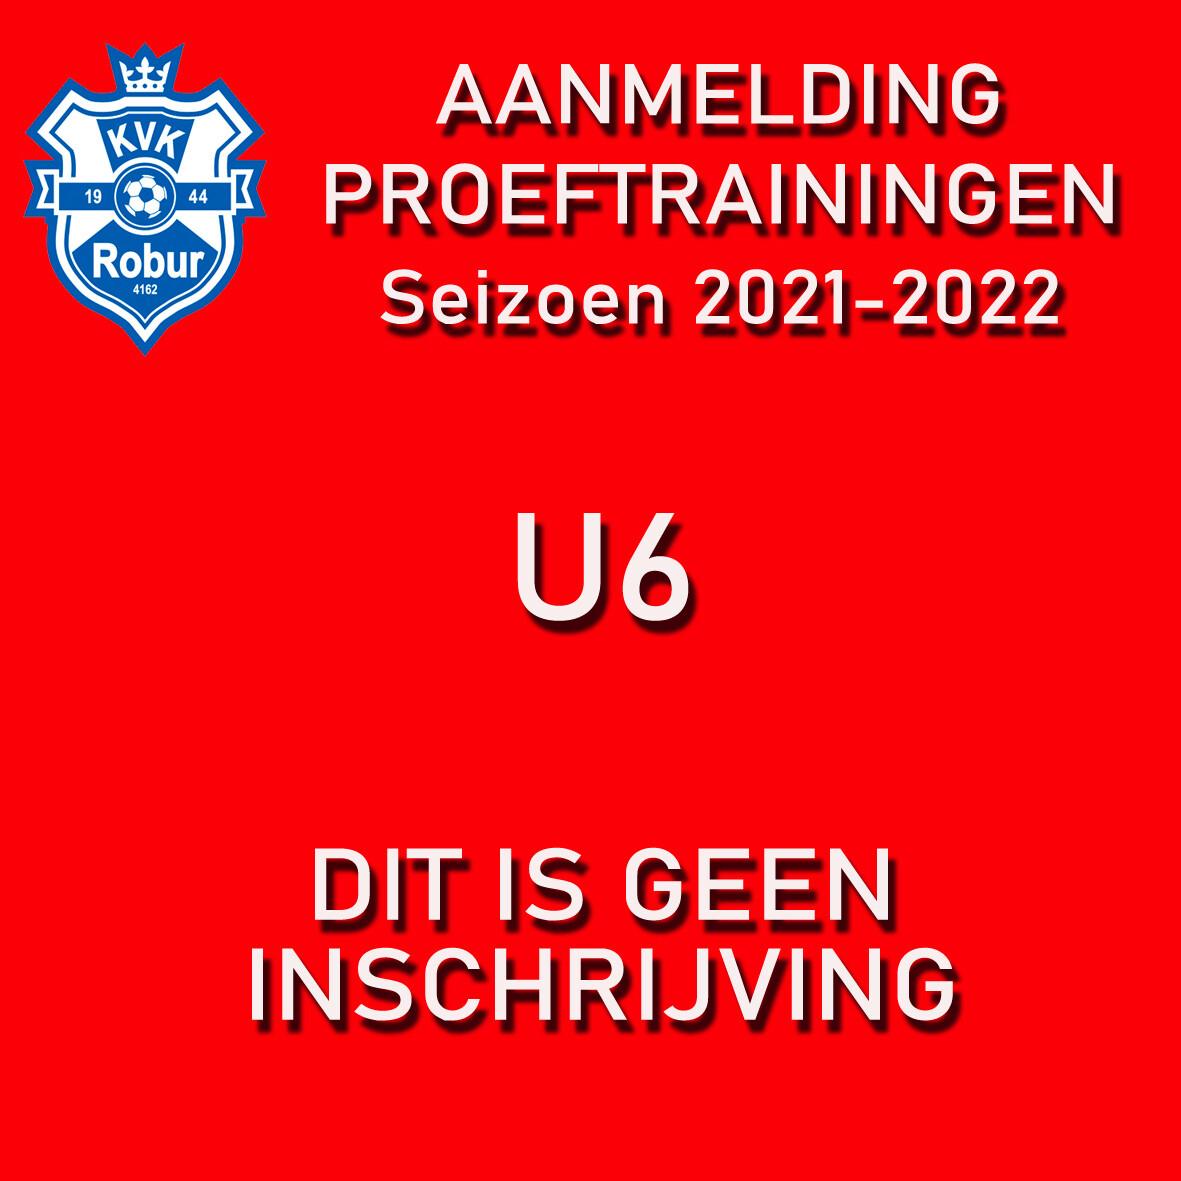 Aanmelding Proeftrainigen U6